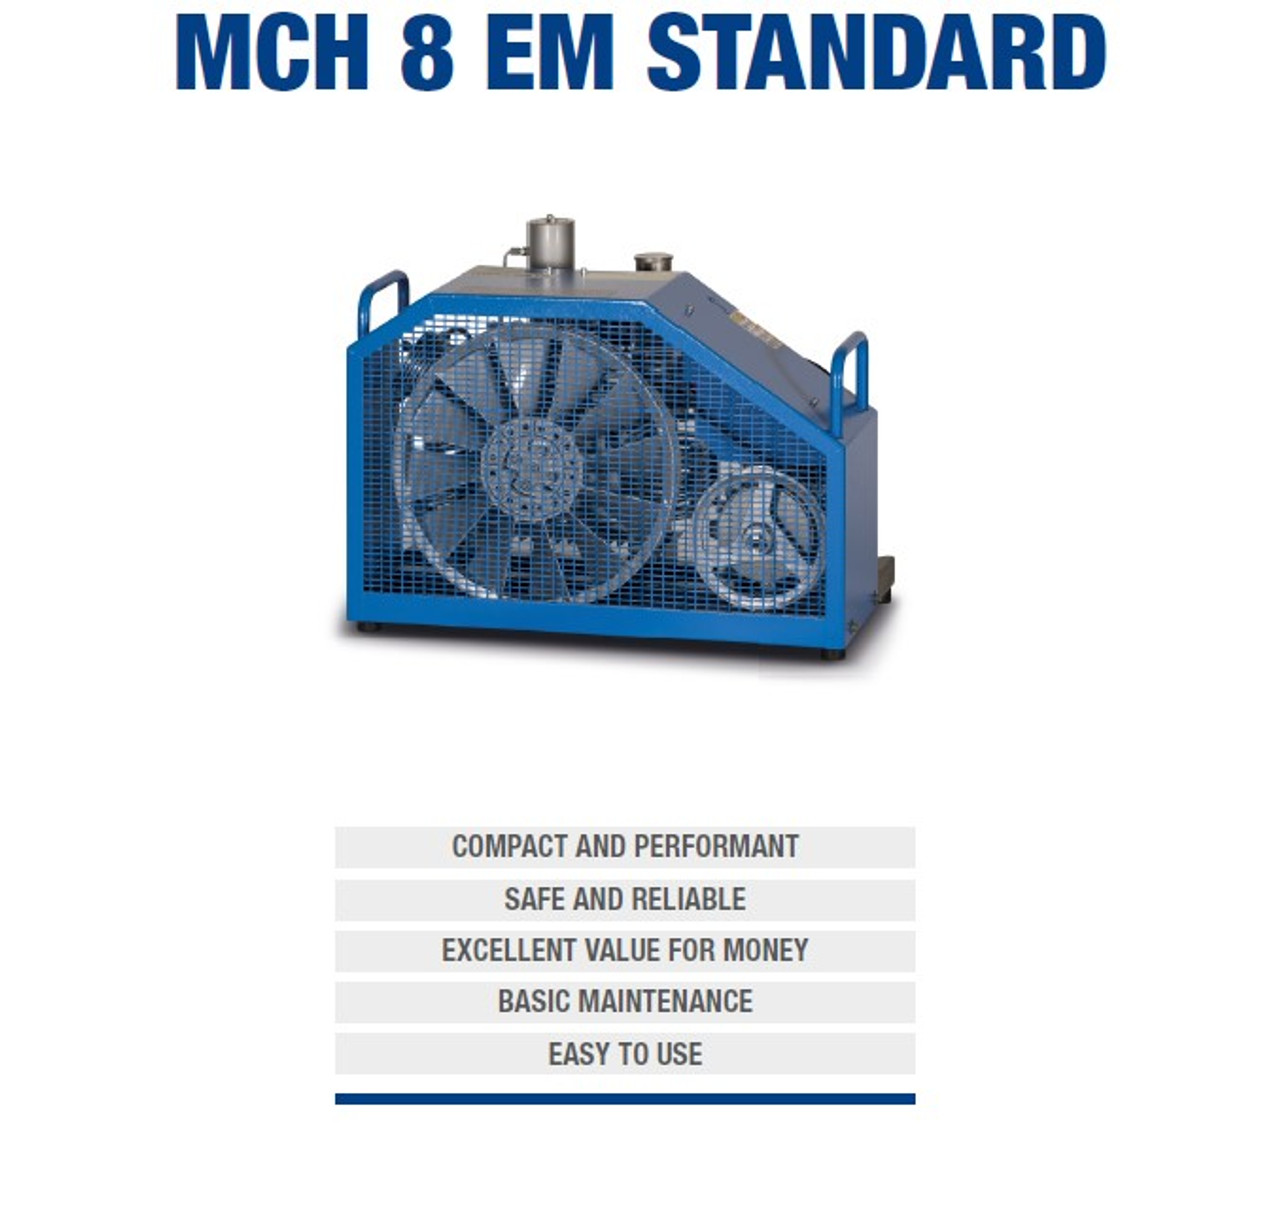 MCH 8 EM STANDARD